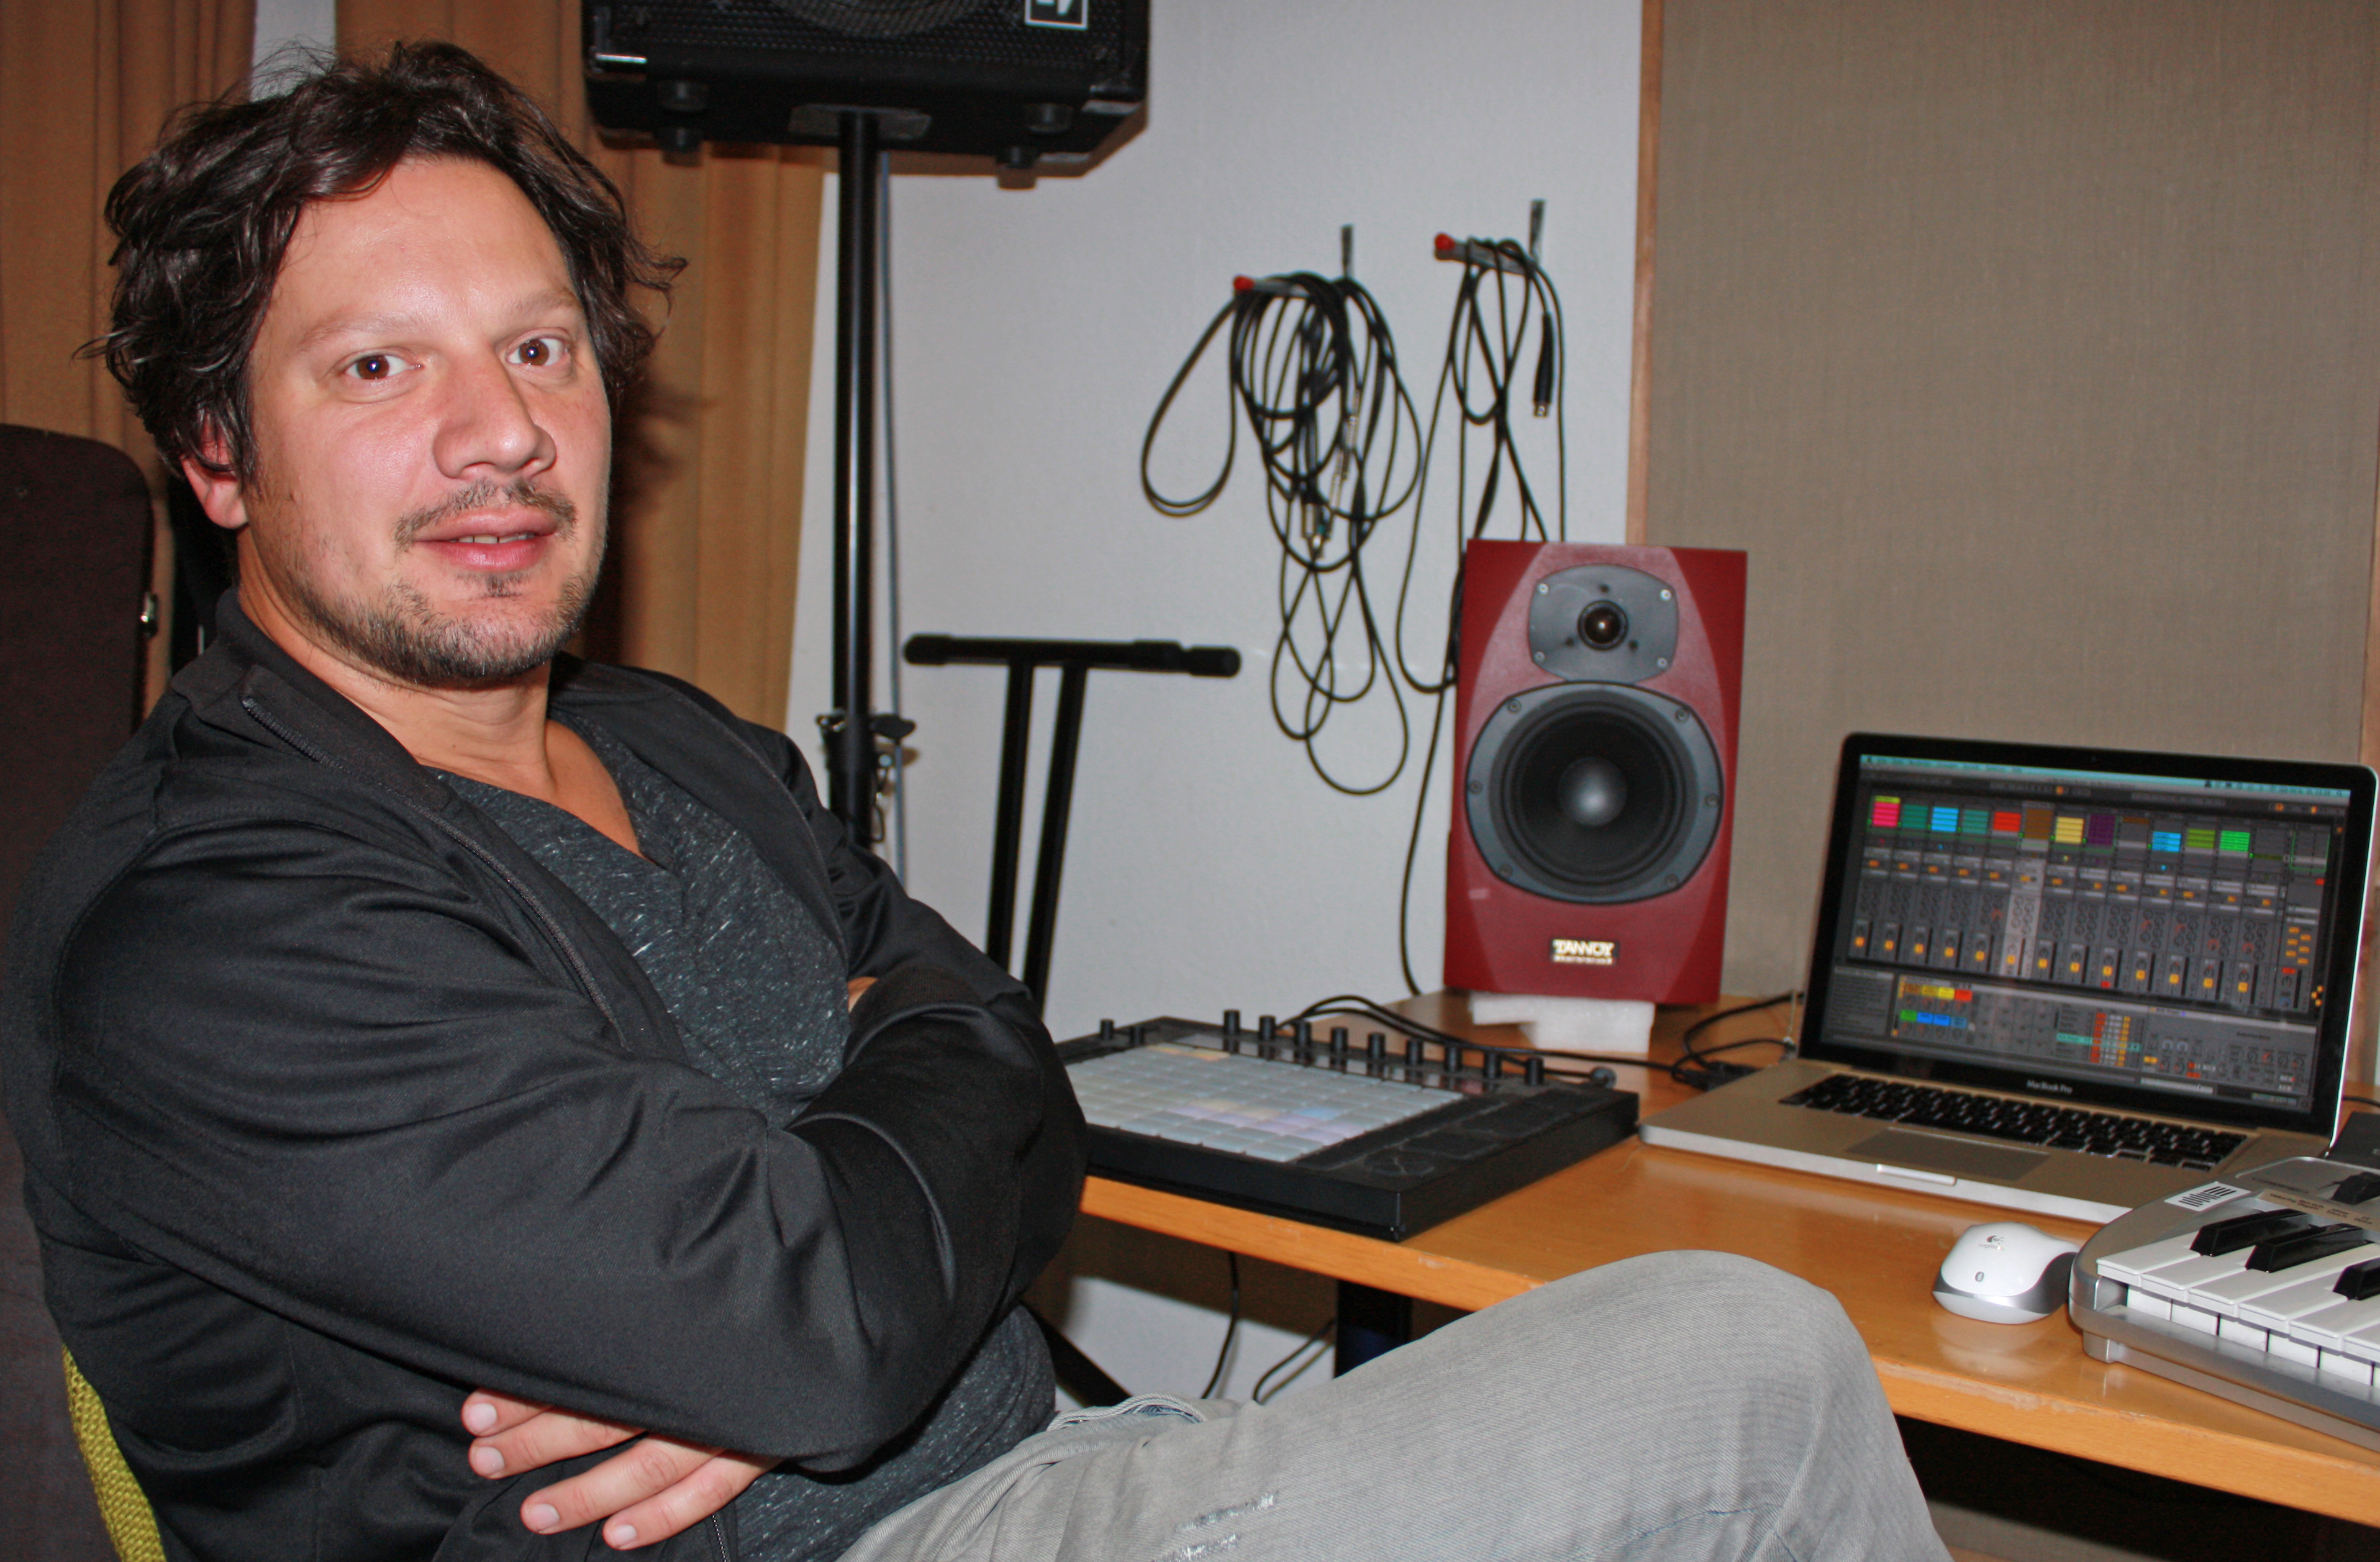 Thomas Palenberg Home Recording DJing (c) Christian Dang-anh